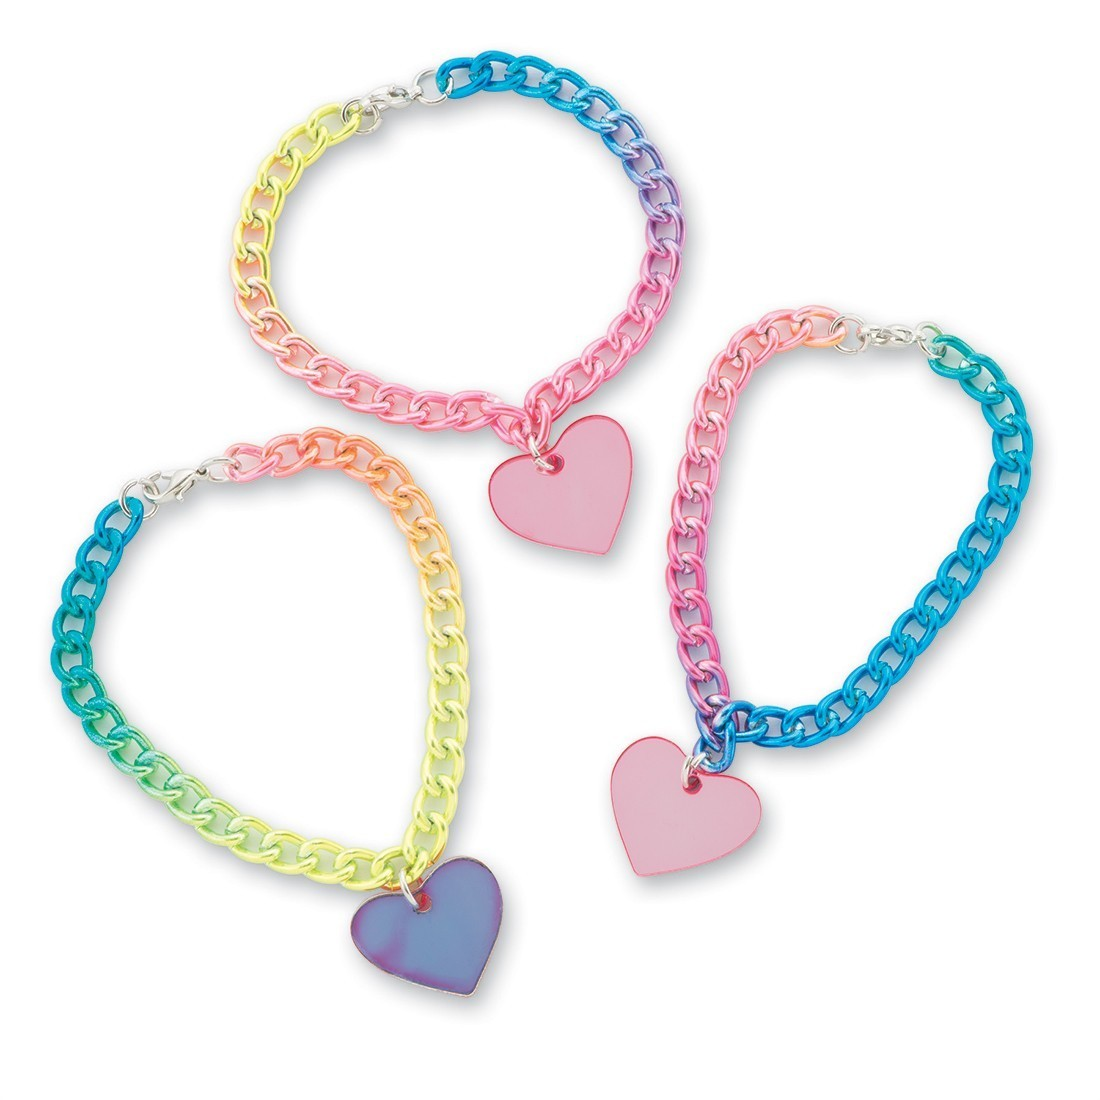 Rainbow Heart Charm Bracelet [image]